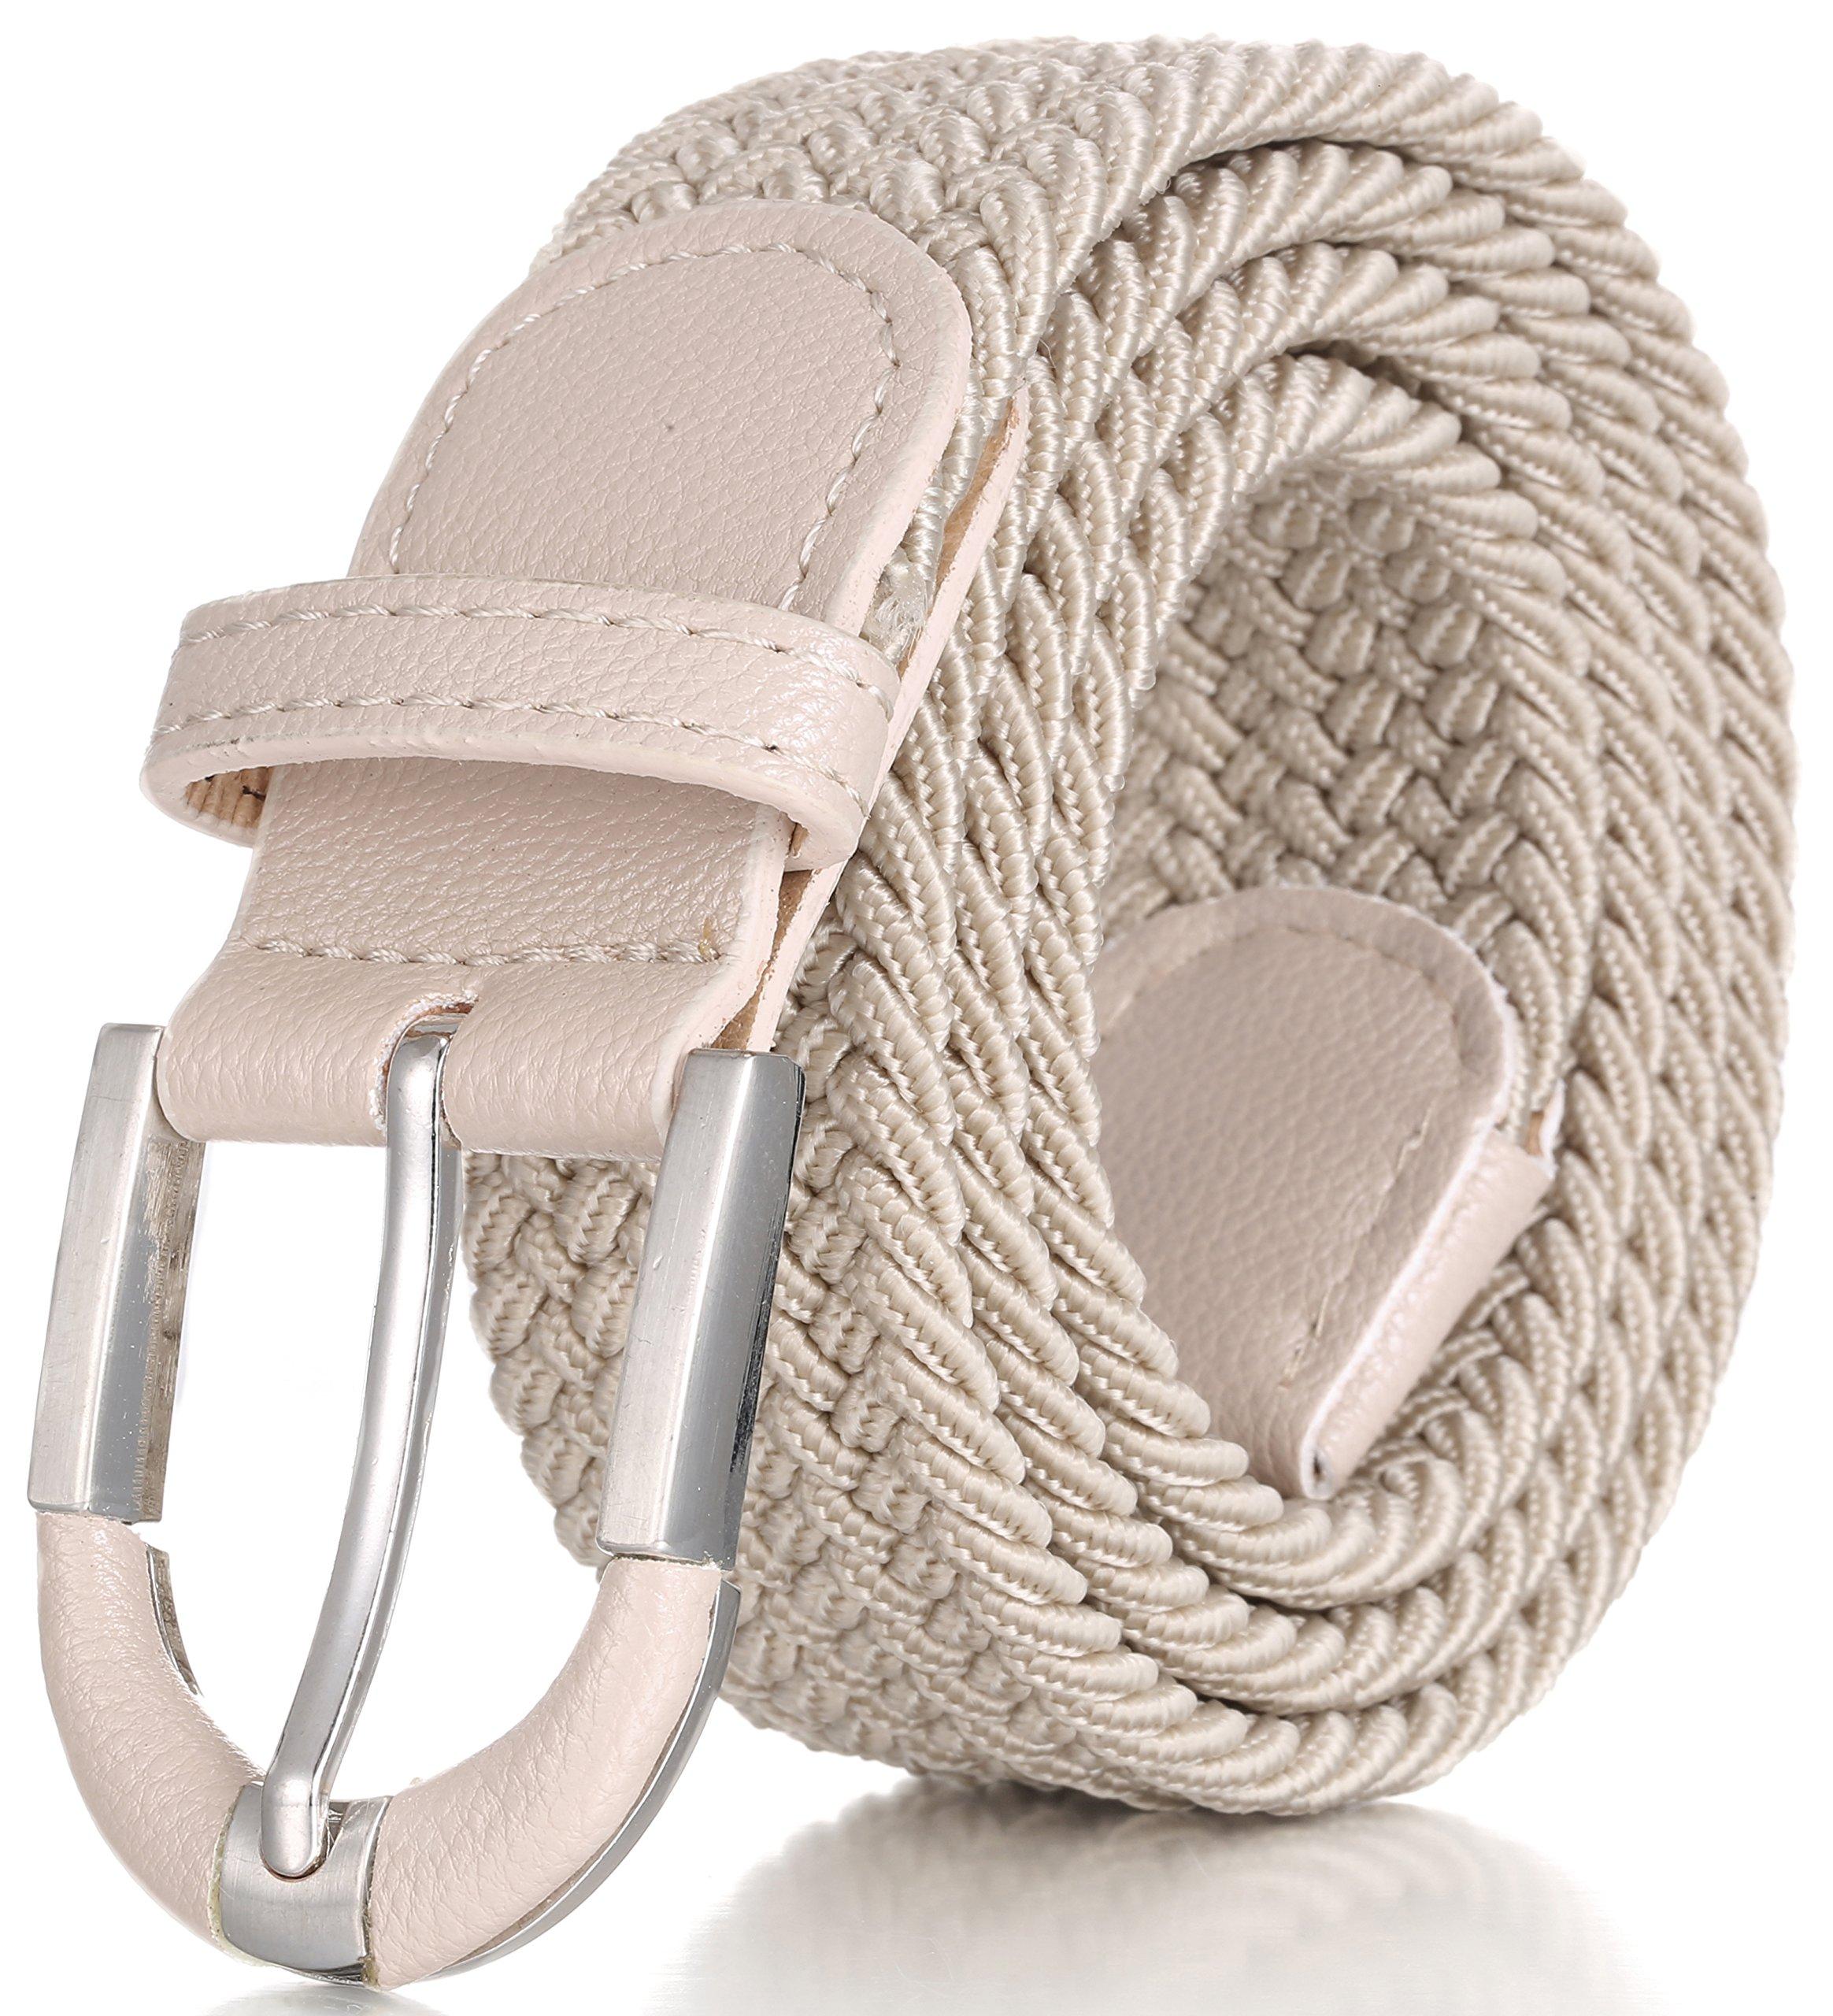 Dunlop PROTON 171BV Unisex Mens//Ladies SB SRA Safety Wellington Boots In White